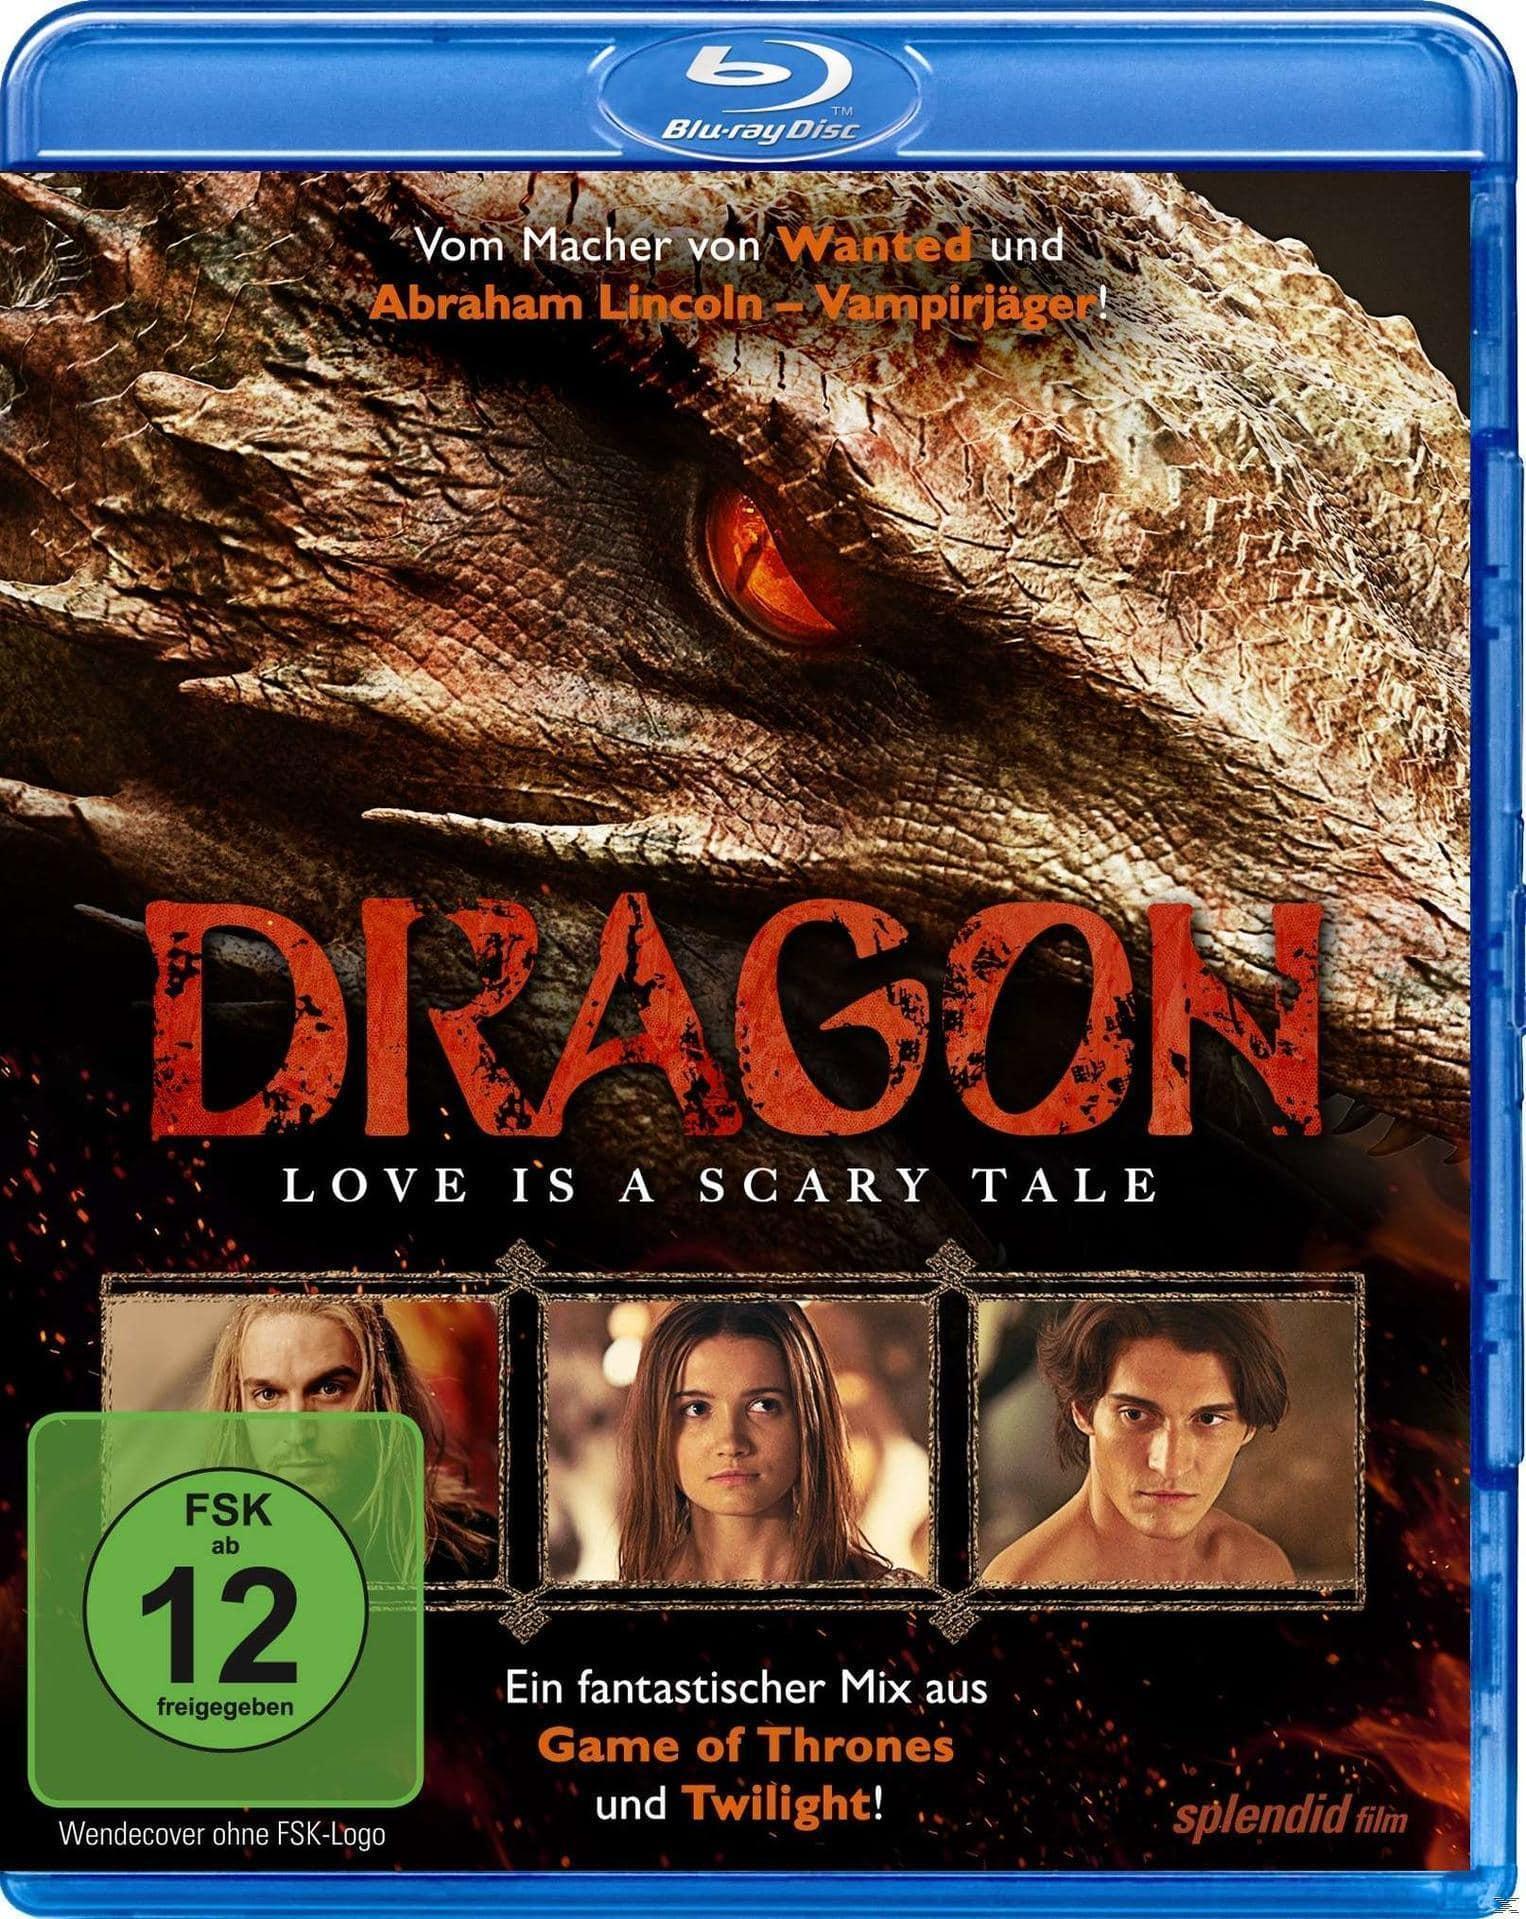 Dragon - Love Is a Scary Tale (BLU-RAY) für 9,99 Euro